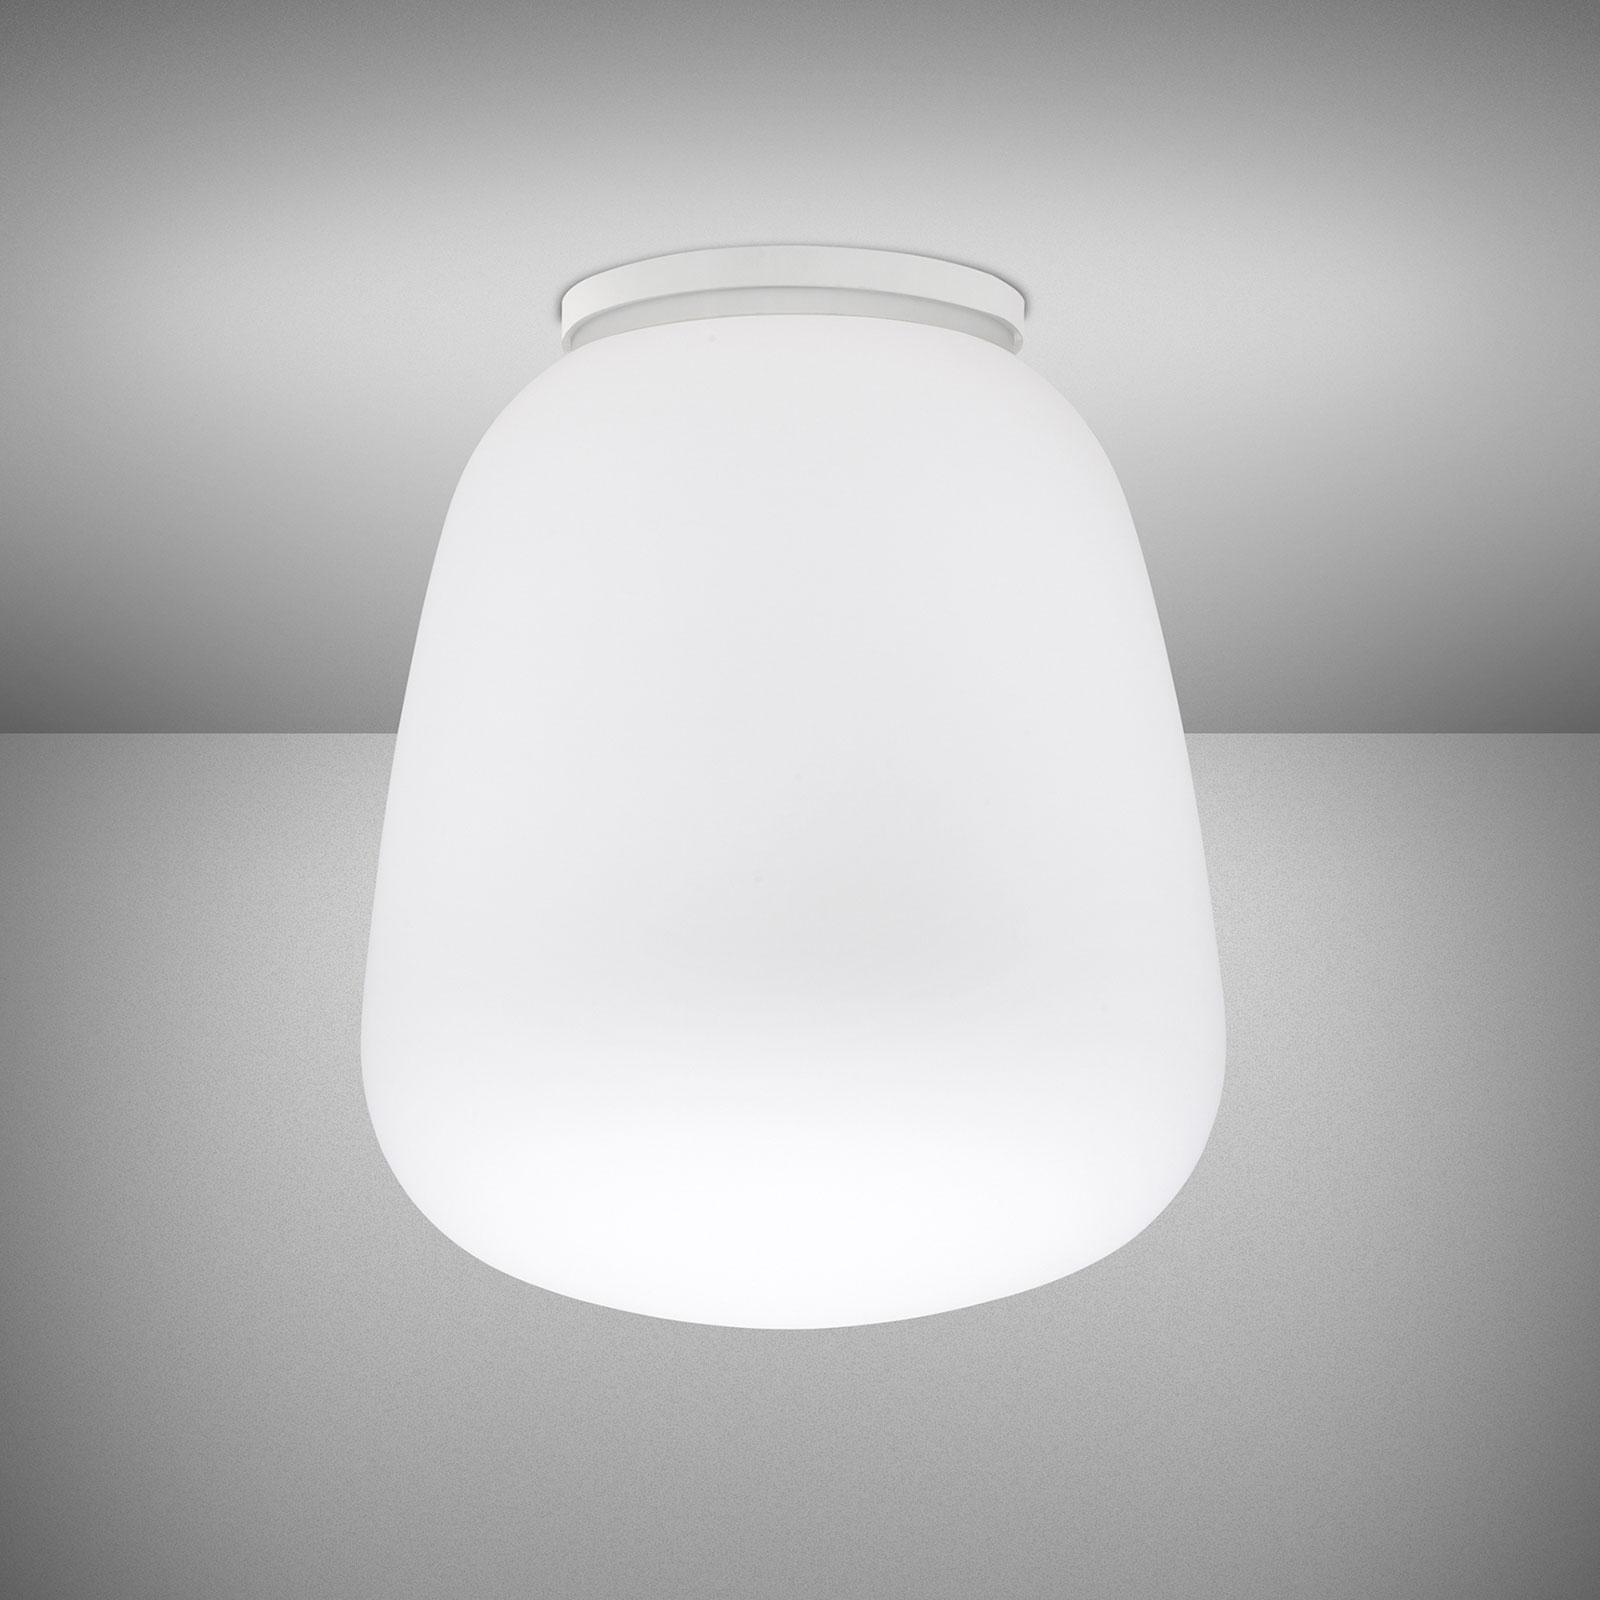 Fabbian Lumi Baka szklana lampa sufitowa, Ø 33 cm